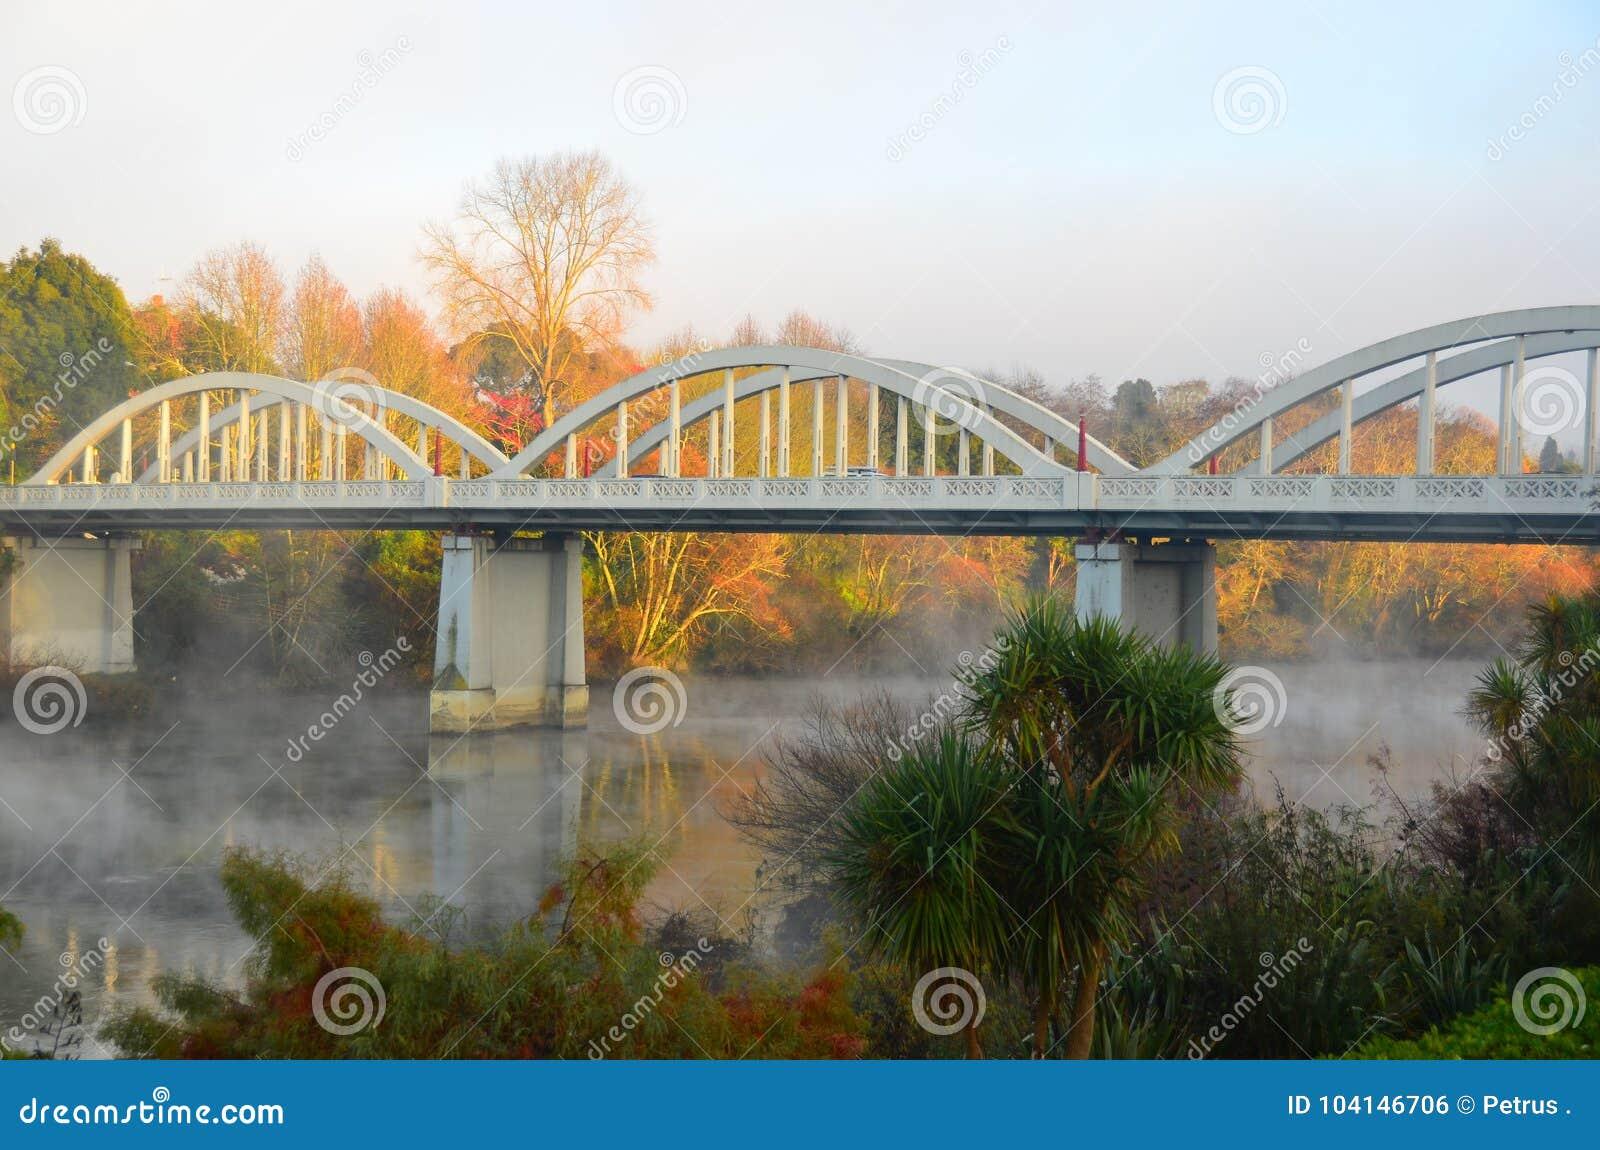 Fairfield Concrete Arch Bridge  Hamilton  New Zealand